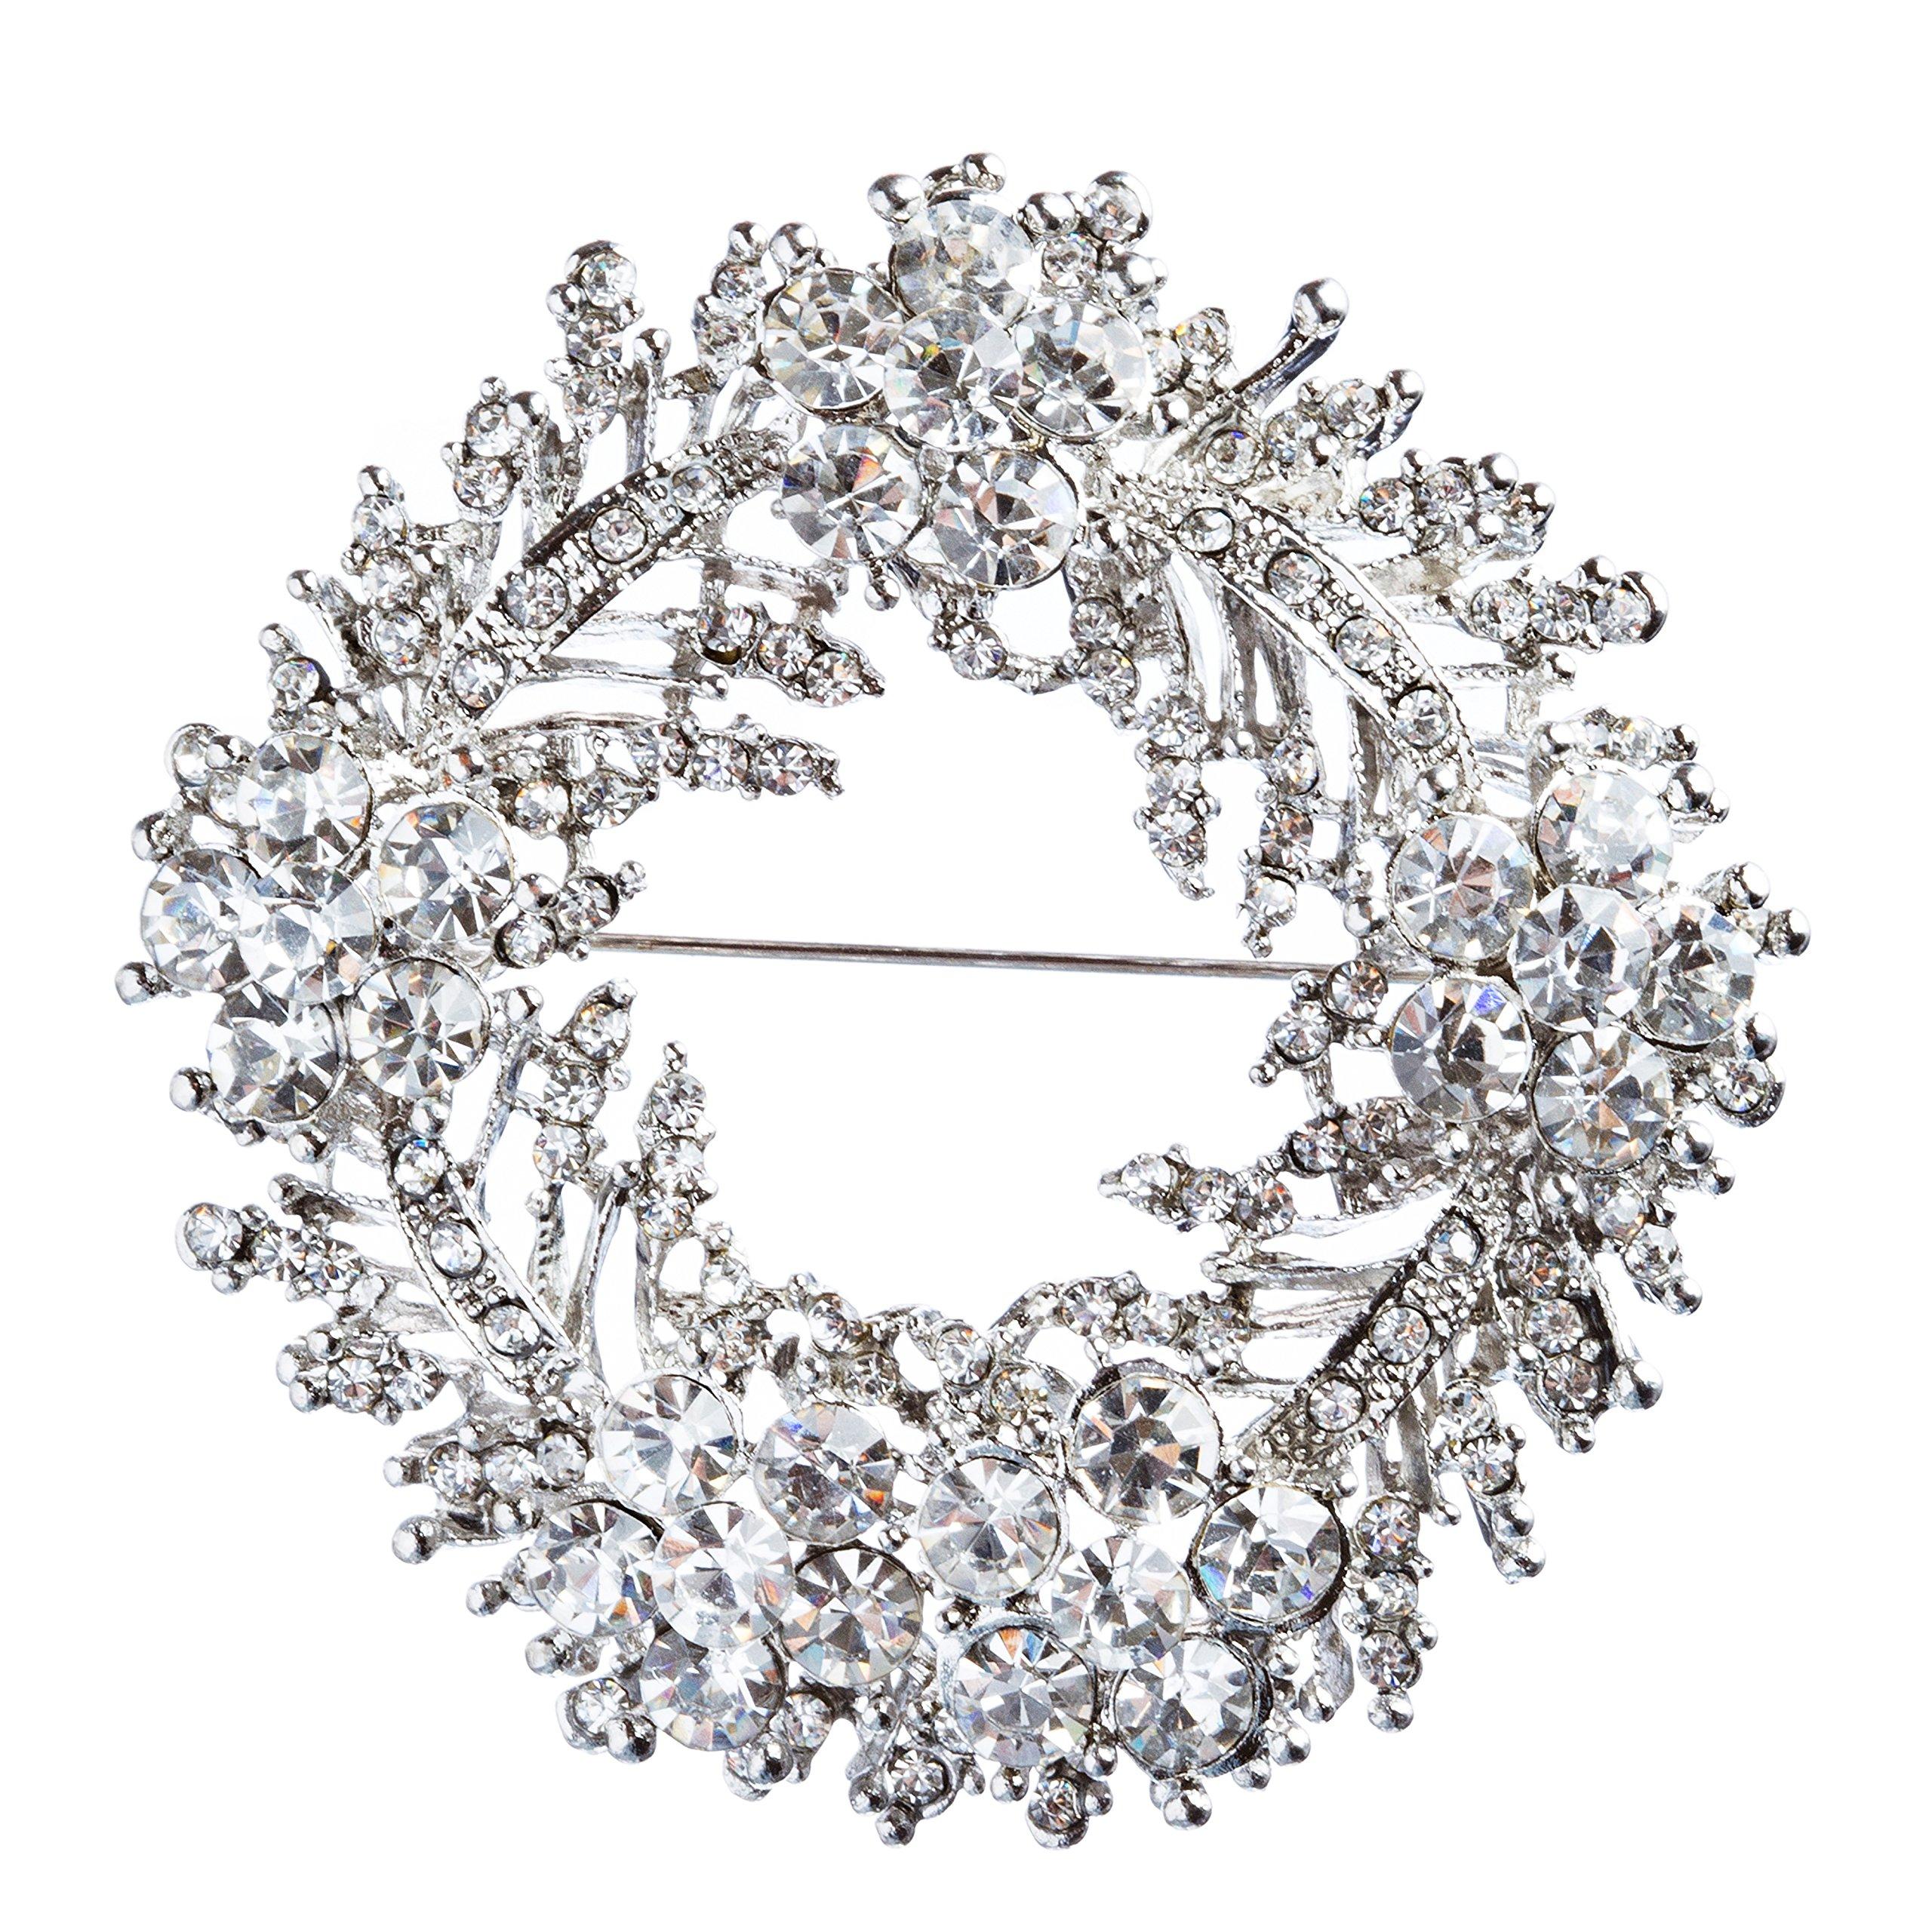 ACCESSORIESFOREVER Women Bridal Wedding Jewelry Crystal Rhinestone Flower Round Brooch Pin BH171 Silver